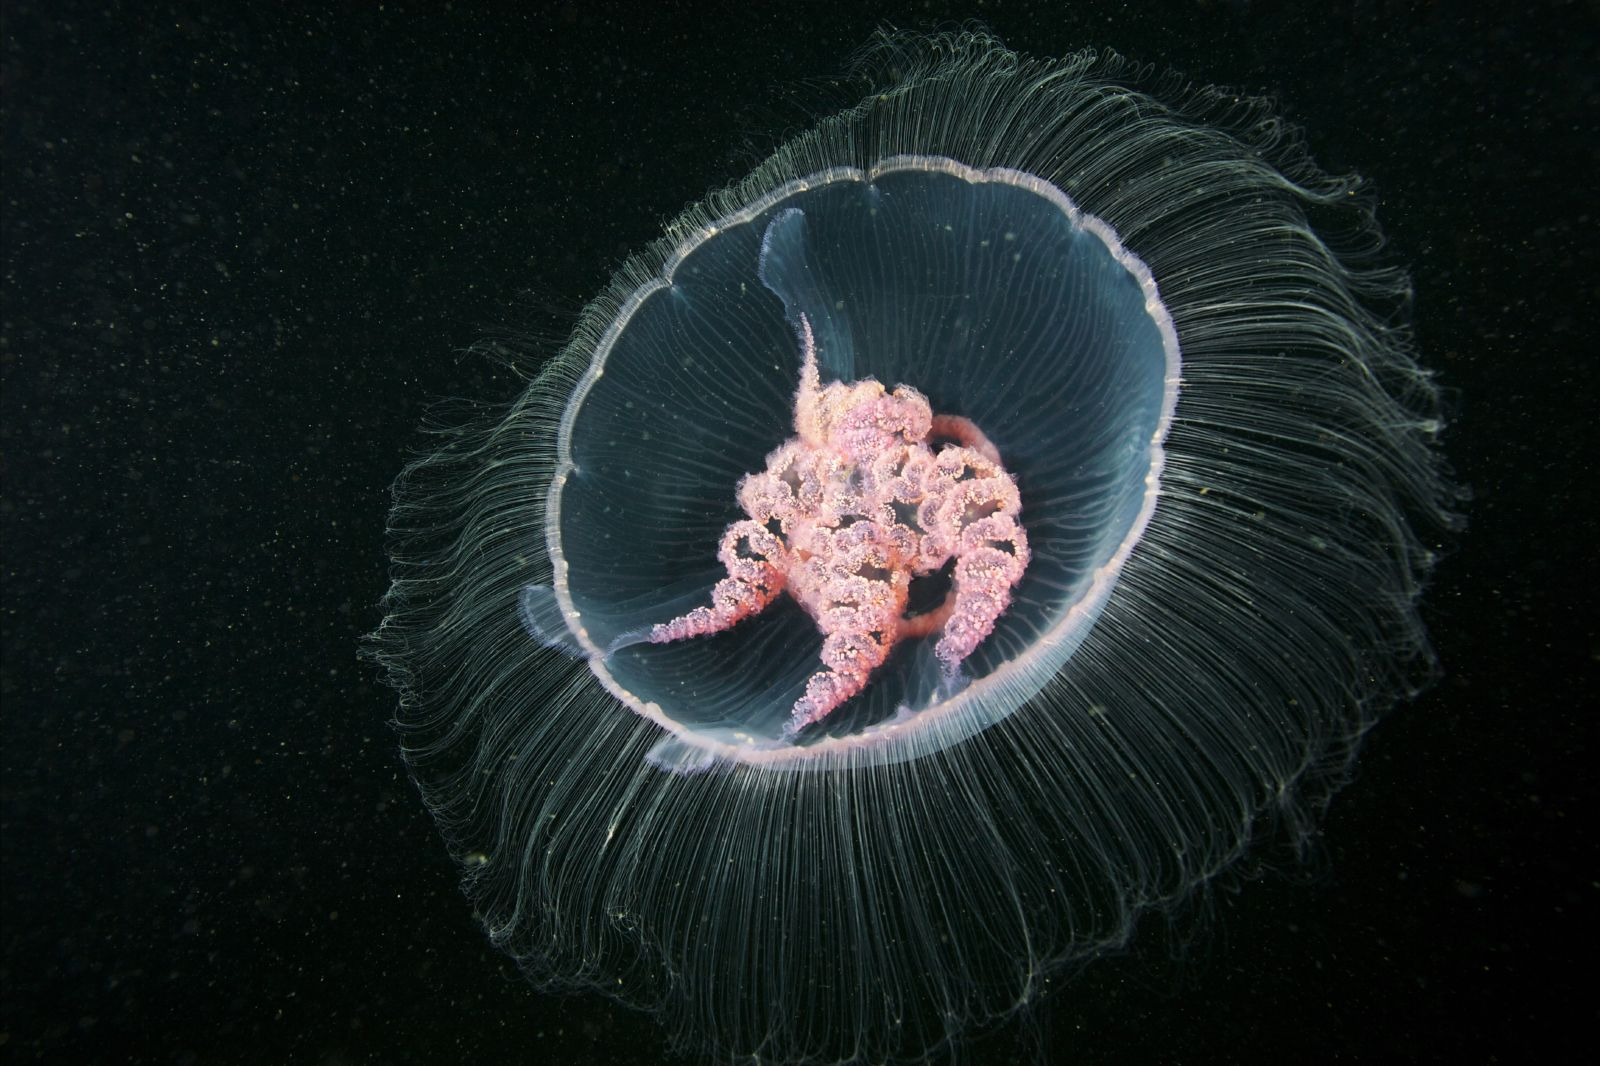 alexander-semenov-aurelia-aurita-5.jpg